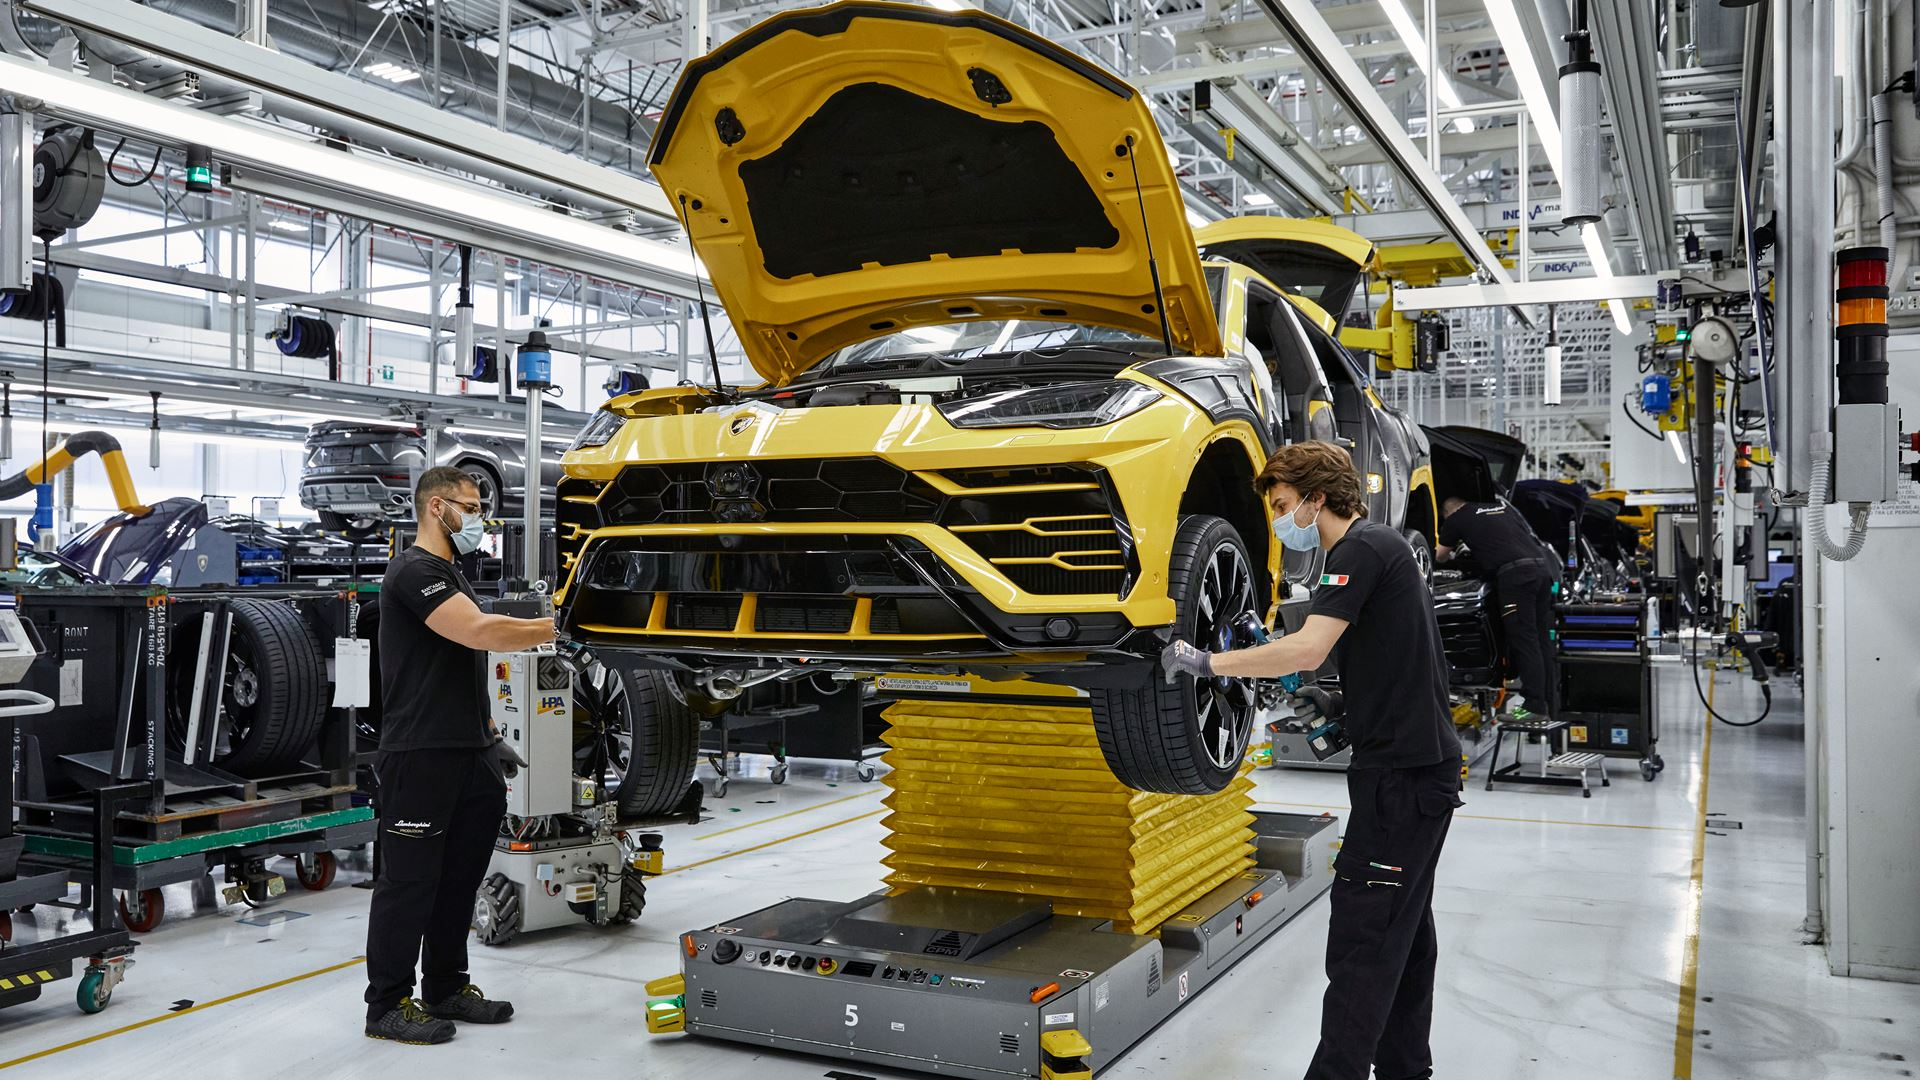 Automobili Lamborghini celebrates the 15,000th Urus - Image 7